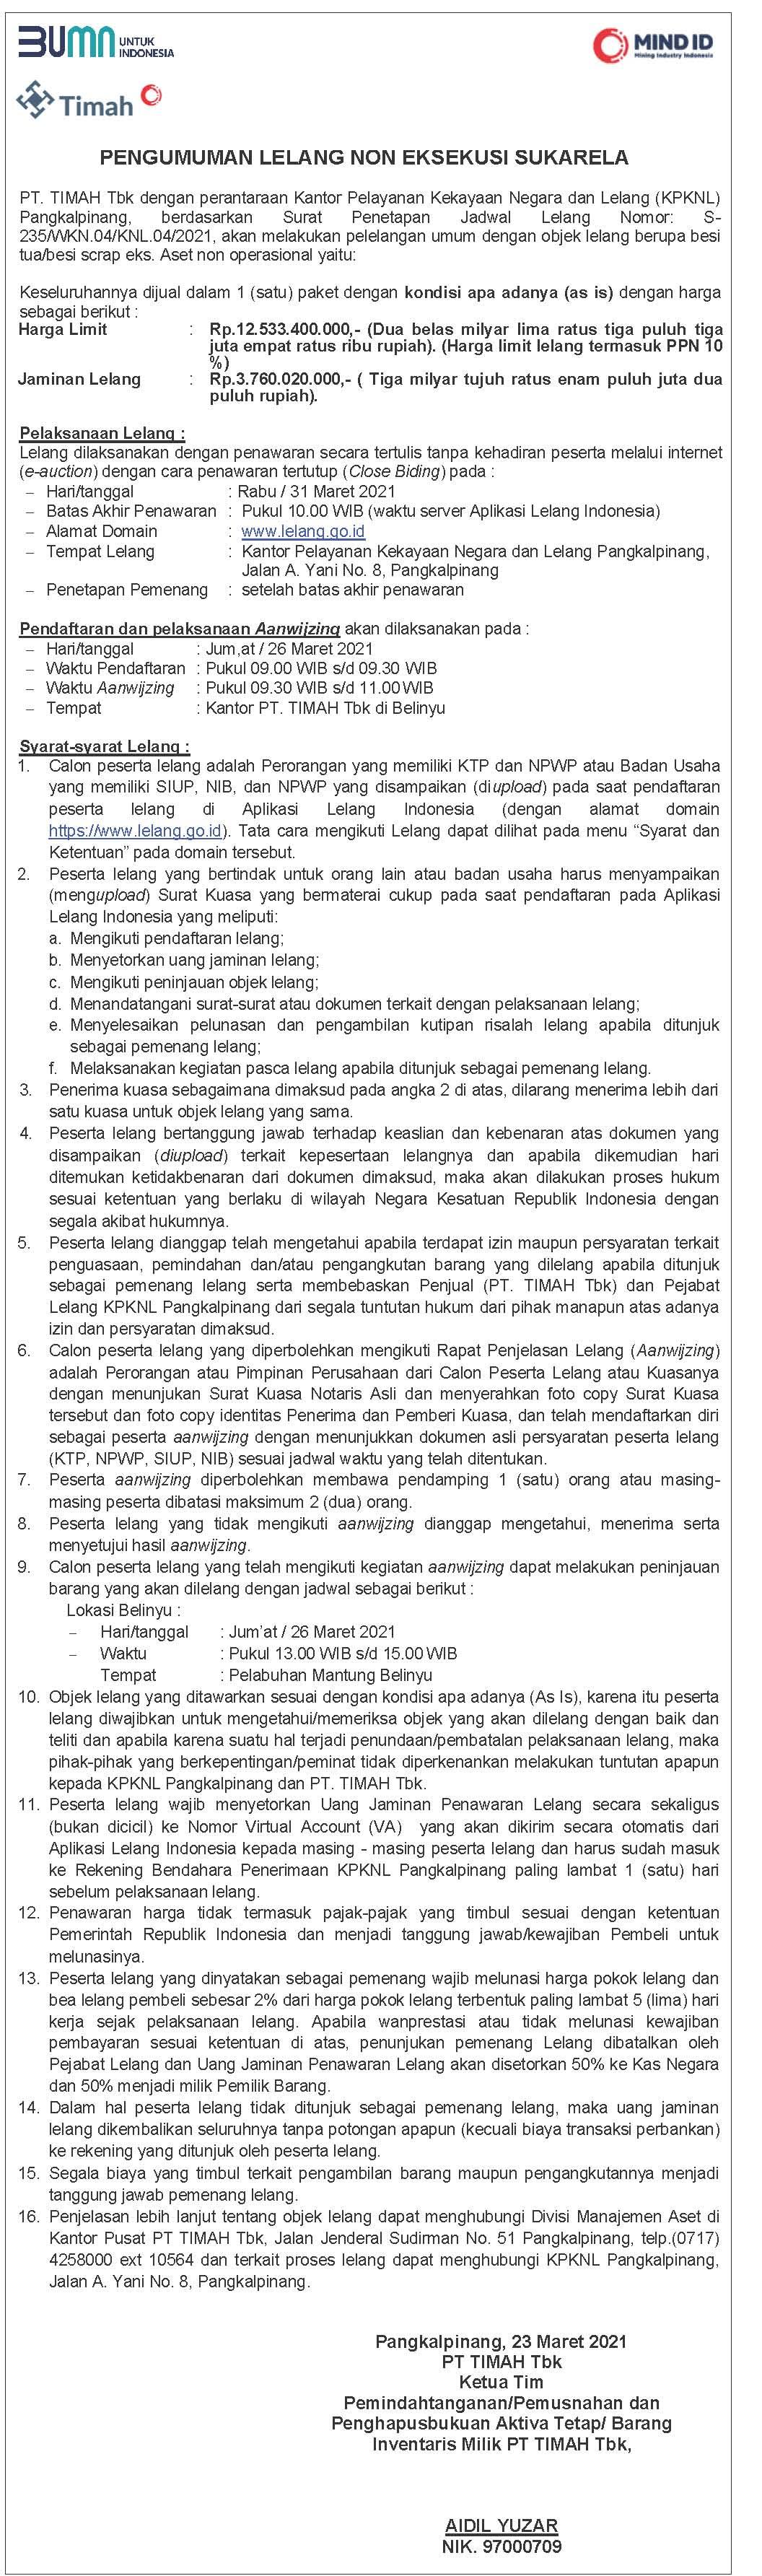 Pengumuman Lelang Non Eksekusi Sukarela Berupa Besi Tua/Besi Scrap Eks. Aset Non Operasional